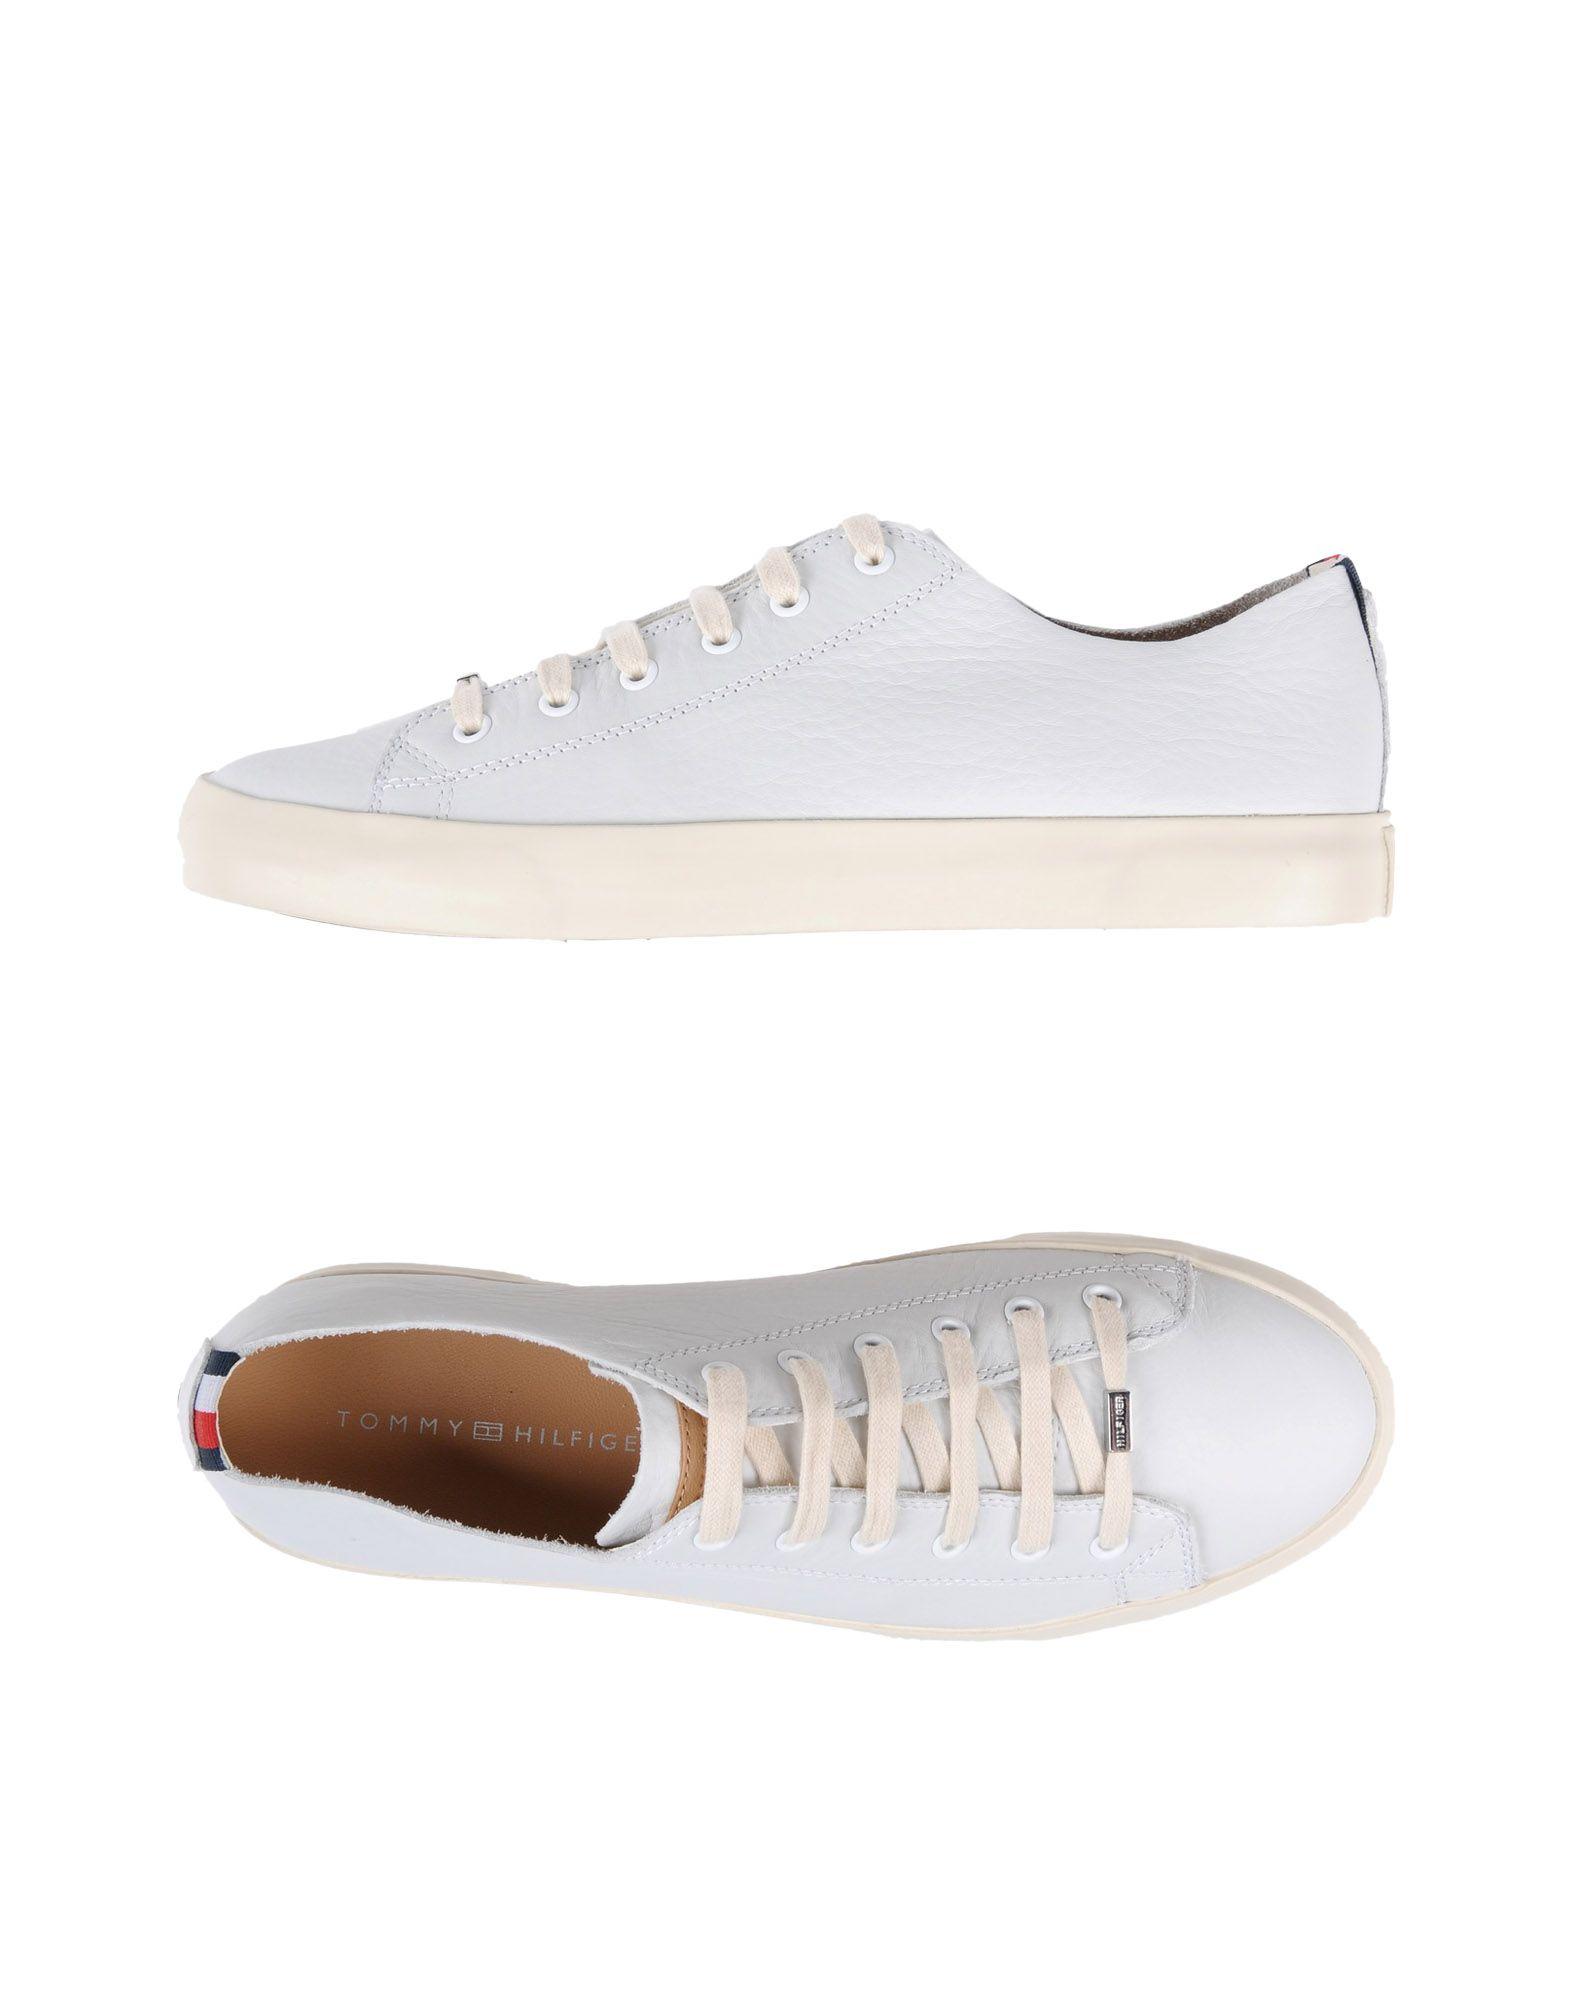 Sneakers Tommy Hilfiger Unlined Leather Low Cut Sneak. - Uomo - Acquista online su